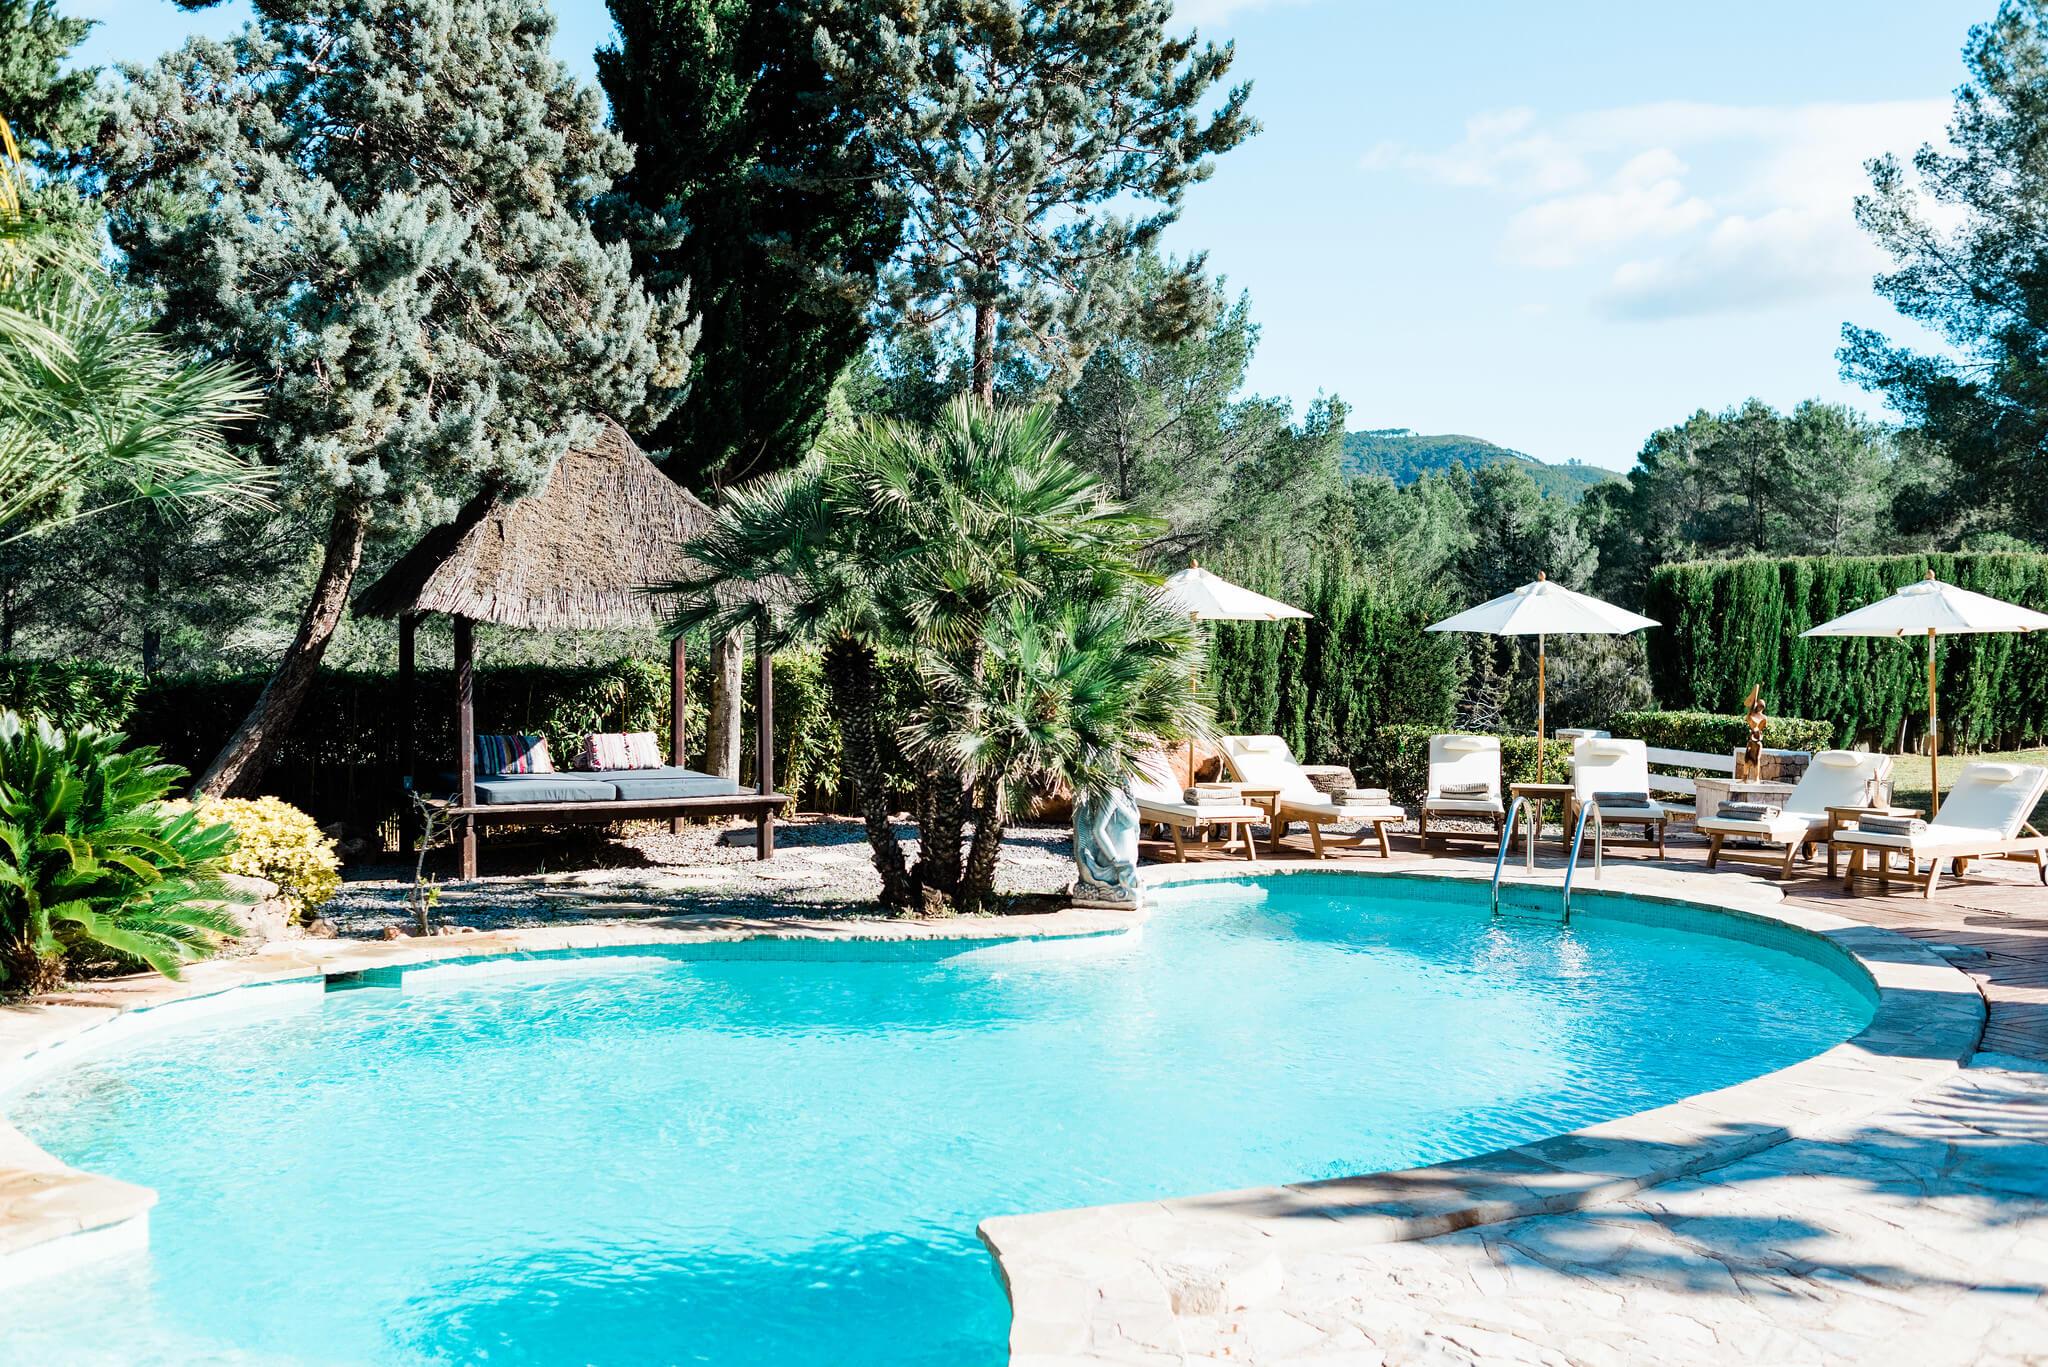 https://www.white-ibiza.com/wp-content/uploads/2020/05/white-ibiza-villas-can-verde-exterior-pool.jpg